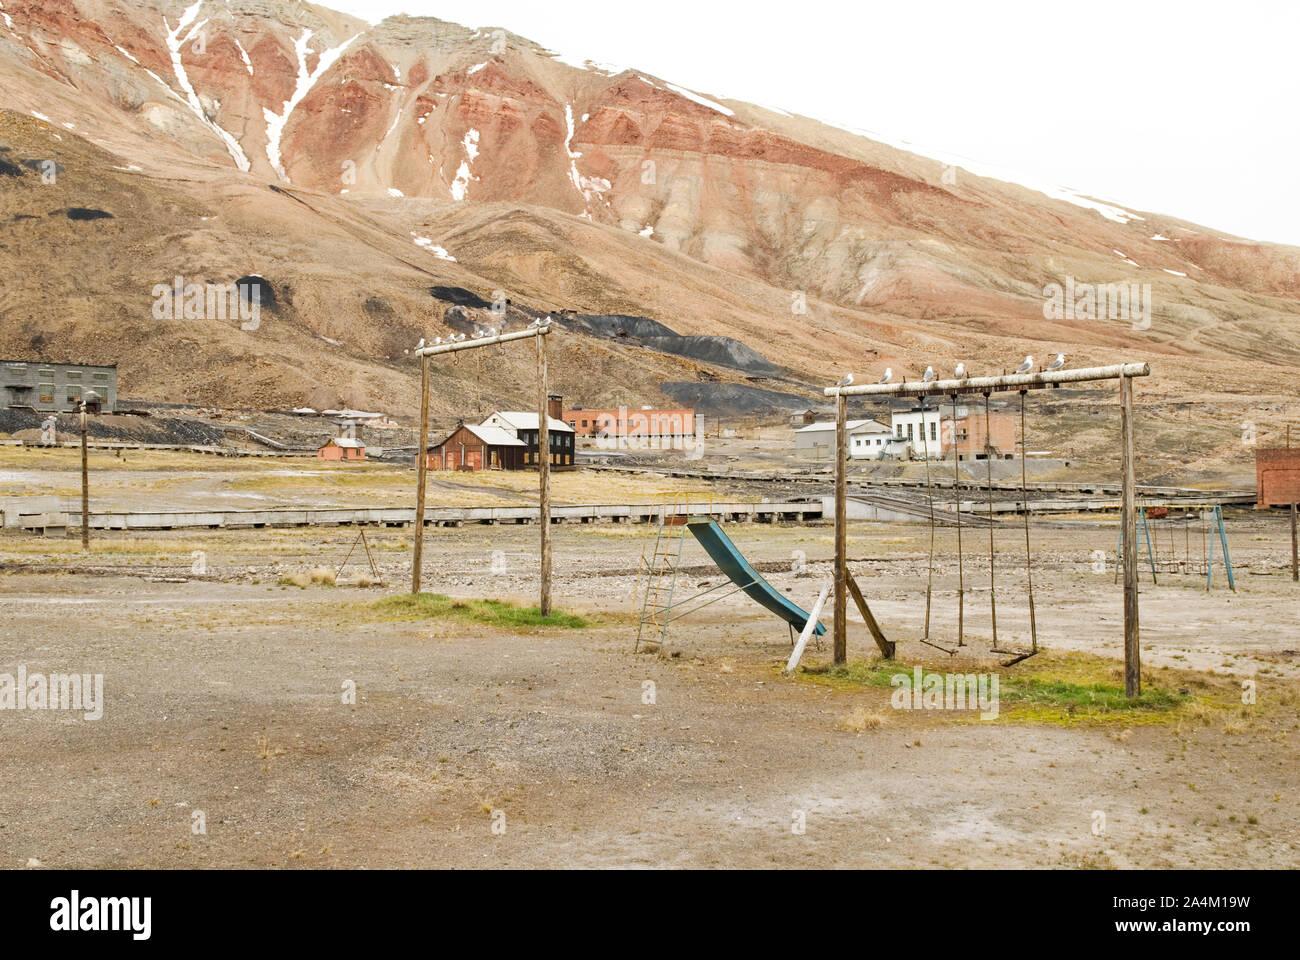 Pyramiden Svalbard Spitsbergen Playground Abandoned Russian Mining Village Stock Photo Alamy